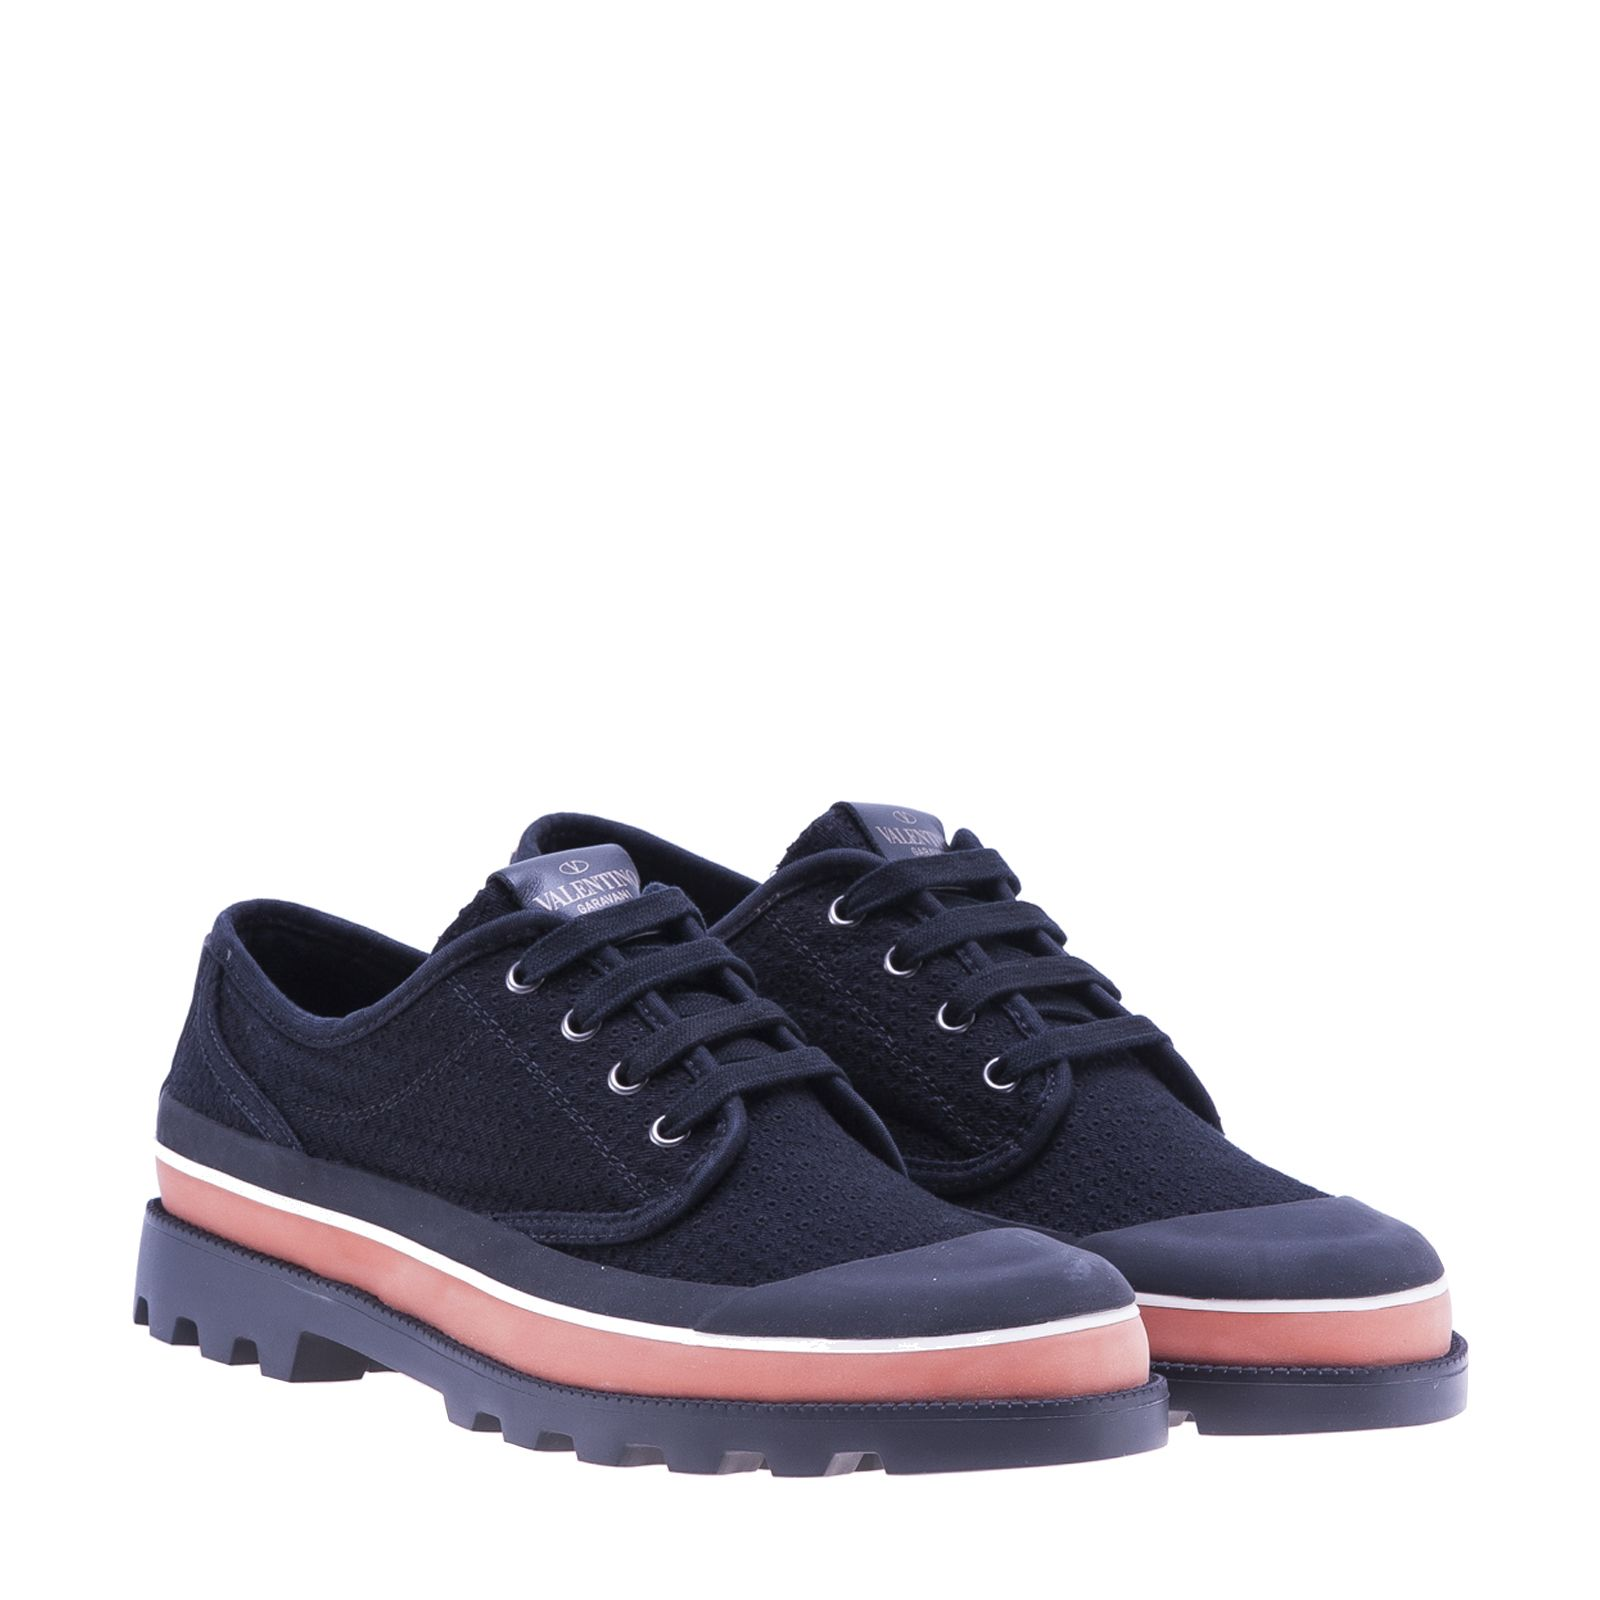 Valentino Gts Sneakers